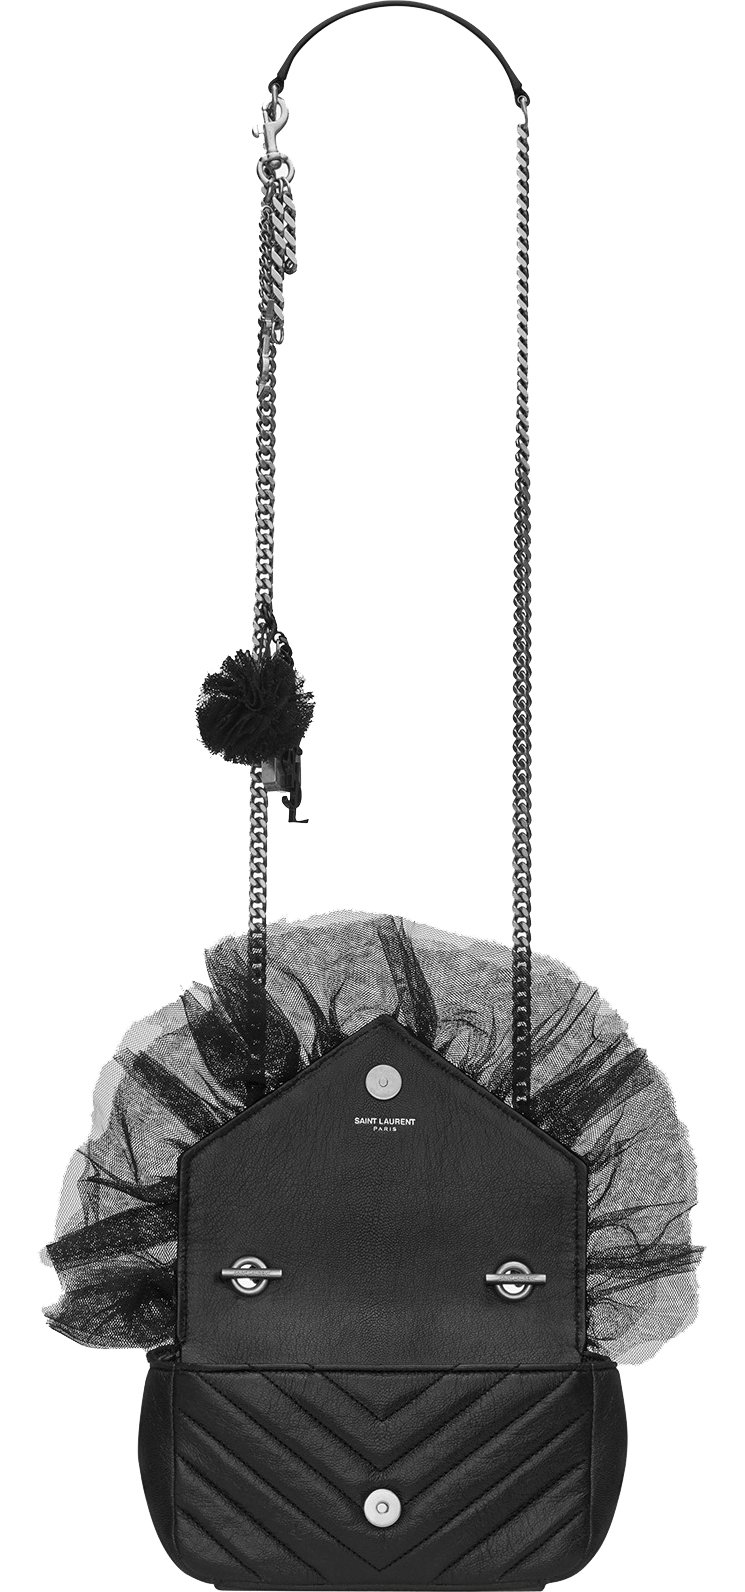 Saint-Laurent-Classic-Baby-Monogram-Punk-Chain-Bag-3